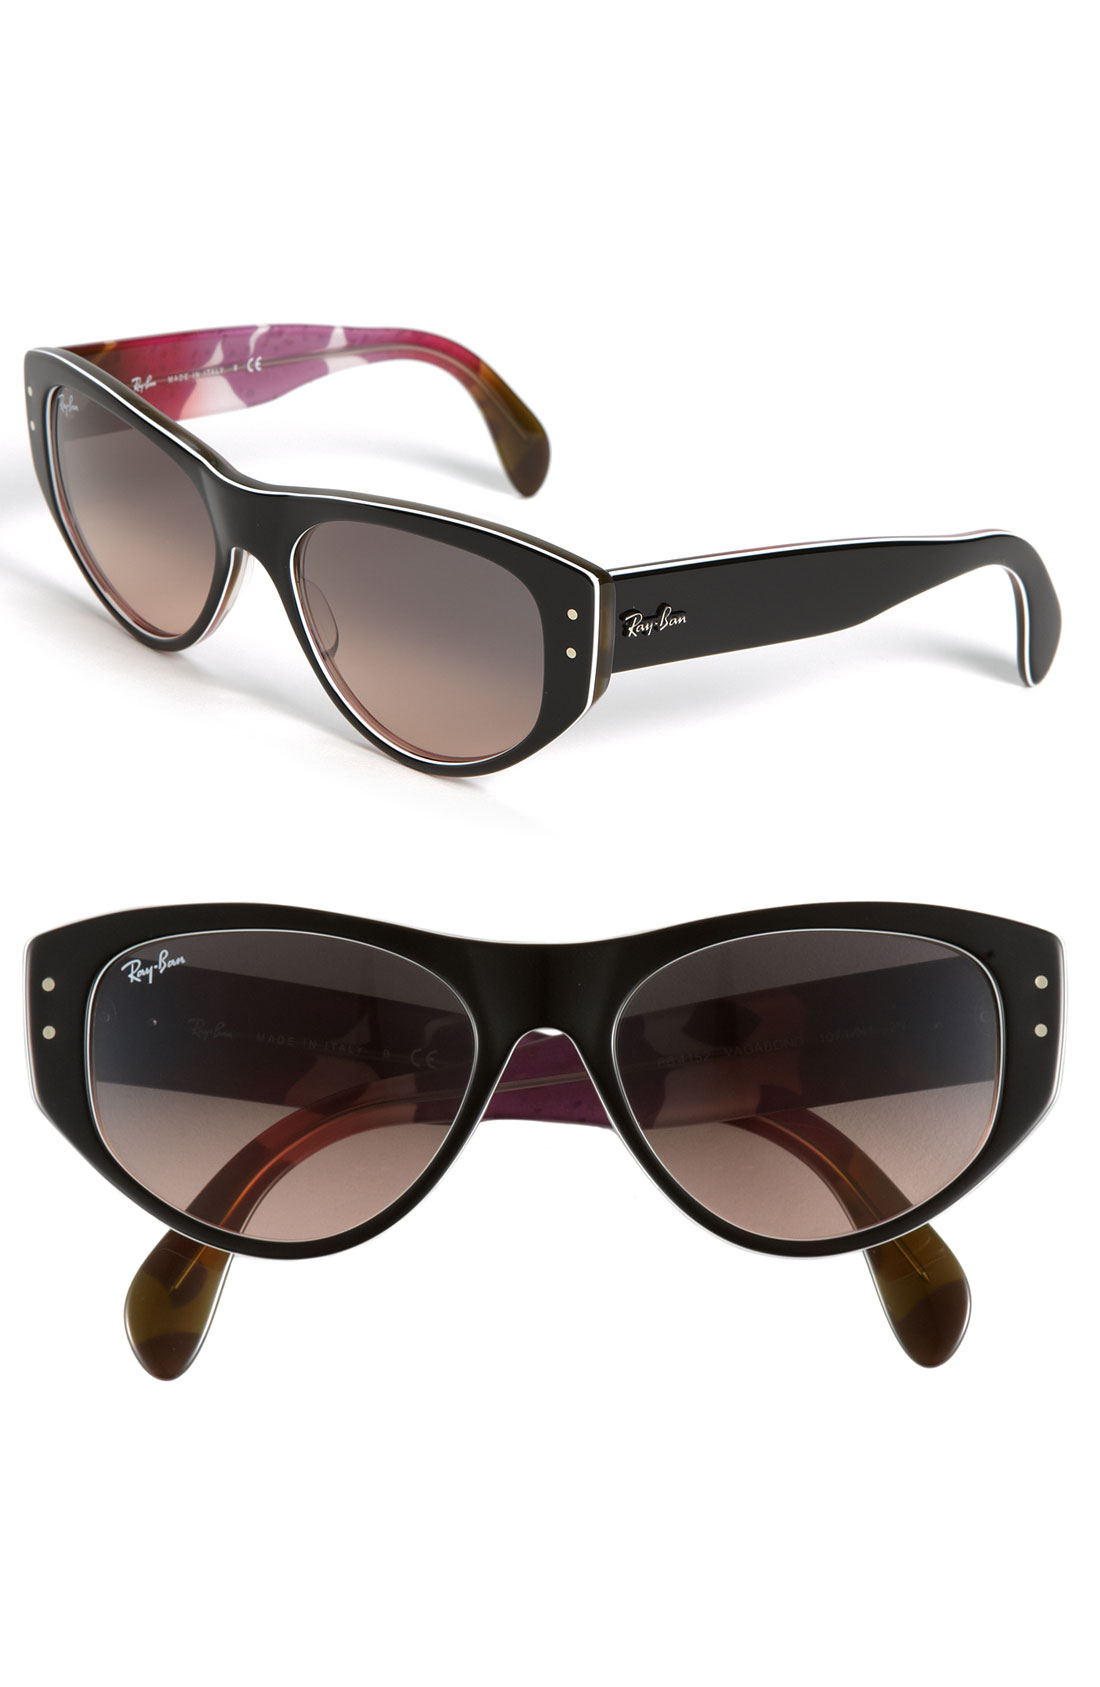 ray ban vagabond cats eye sunglasses in black tortoise. Black Bedroom Furniture Sets. Home Design Ideas